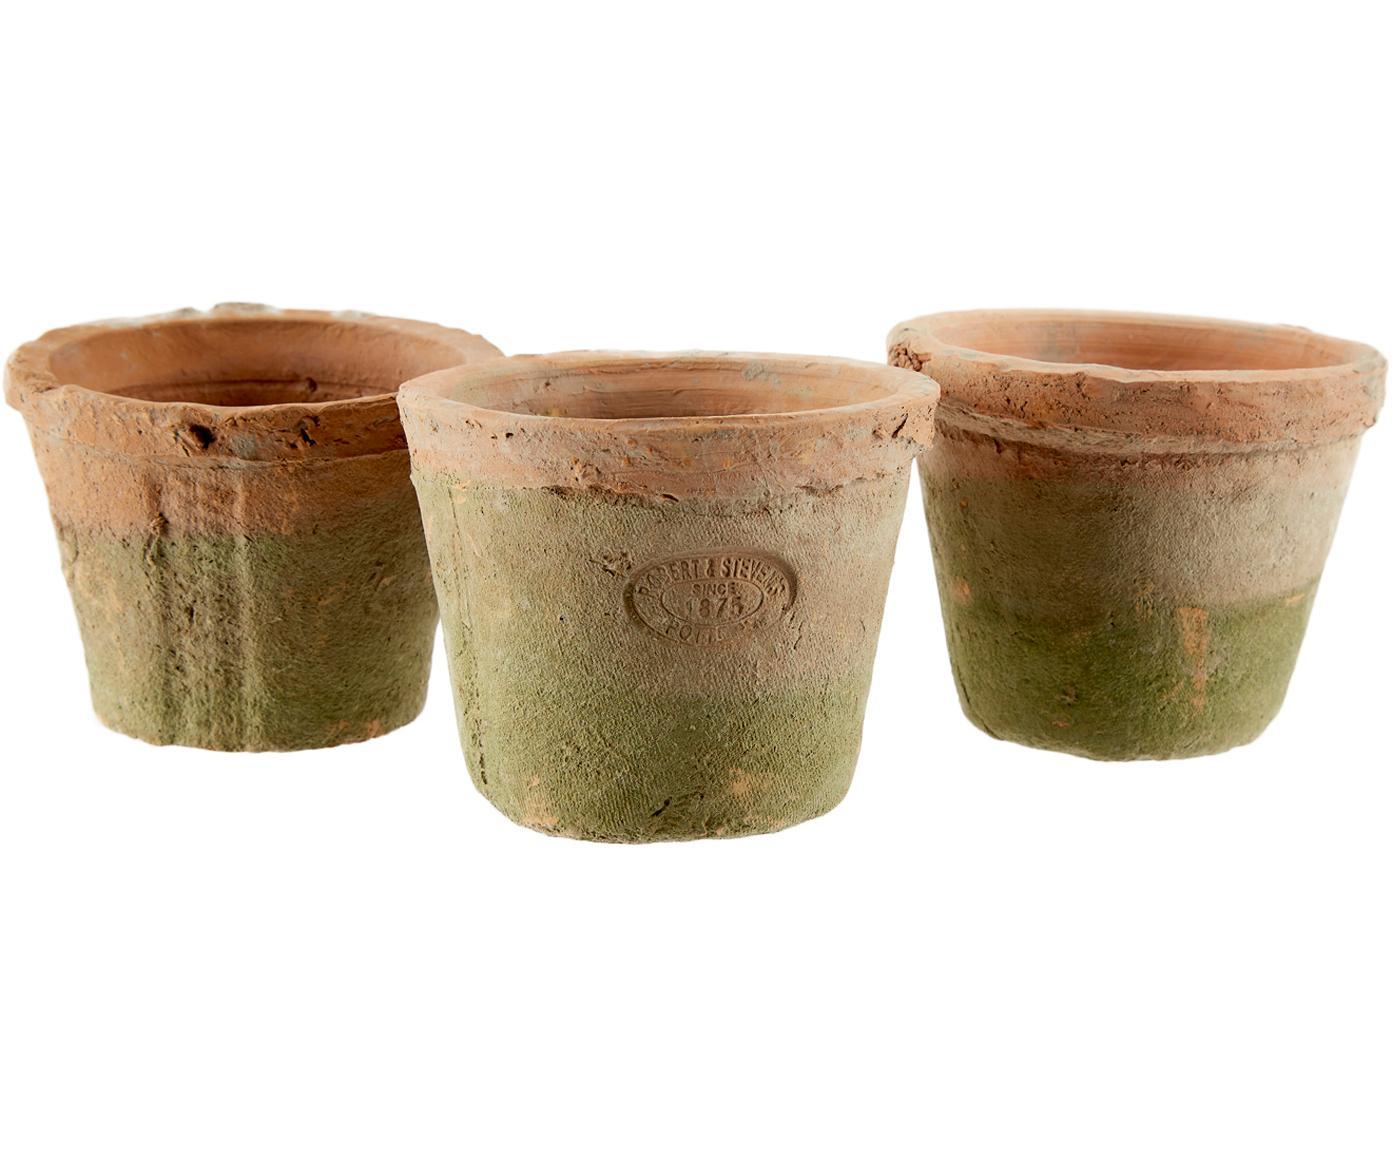 Set portavasi Daria 4 pz, Portavasi: terracotta, Terracotta, marrone, Larg. 37 x Alt. 9 cm